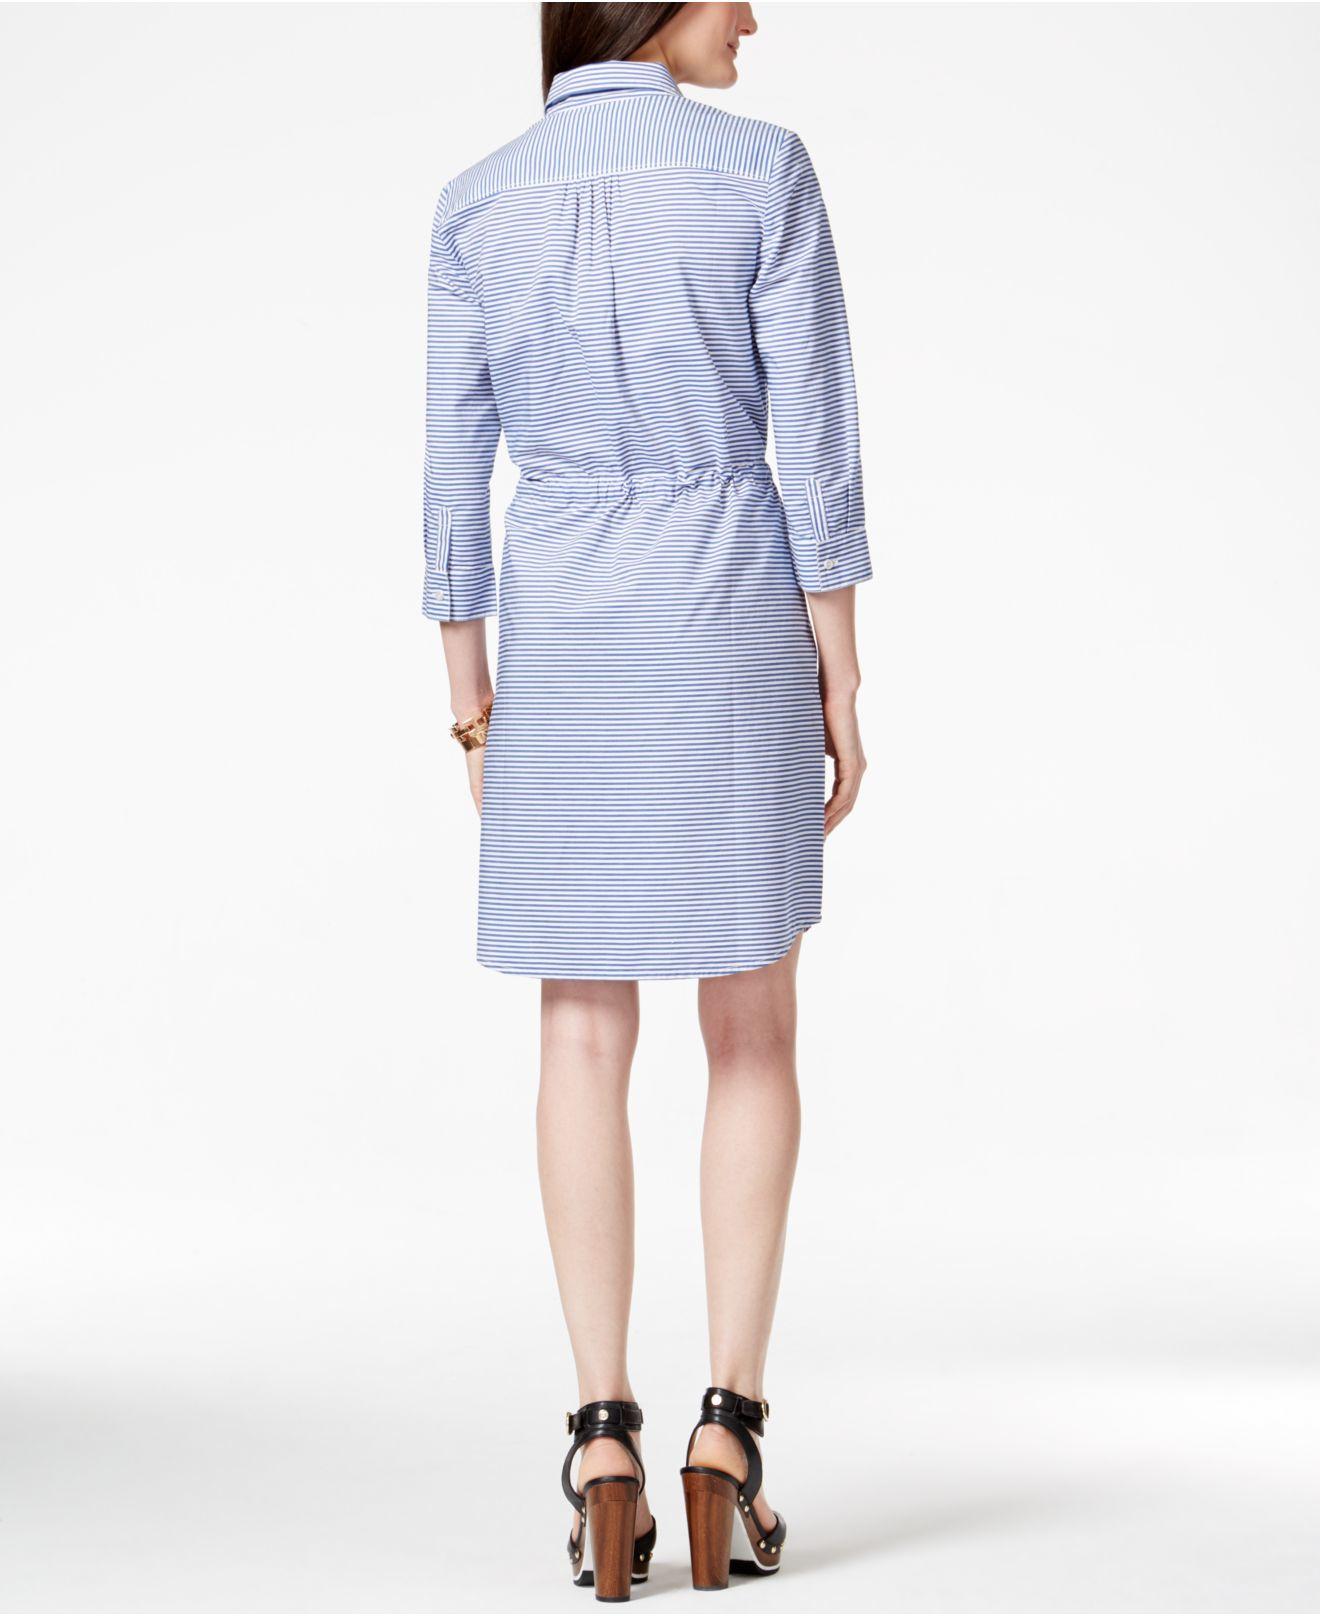 striped shirt dress - Blue Tommy Hilfiger 1mUhSCsJ